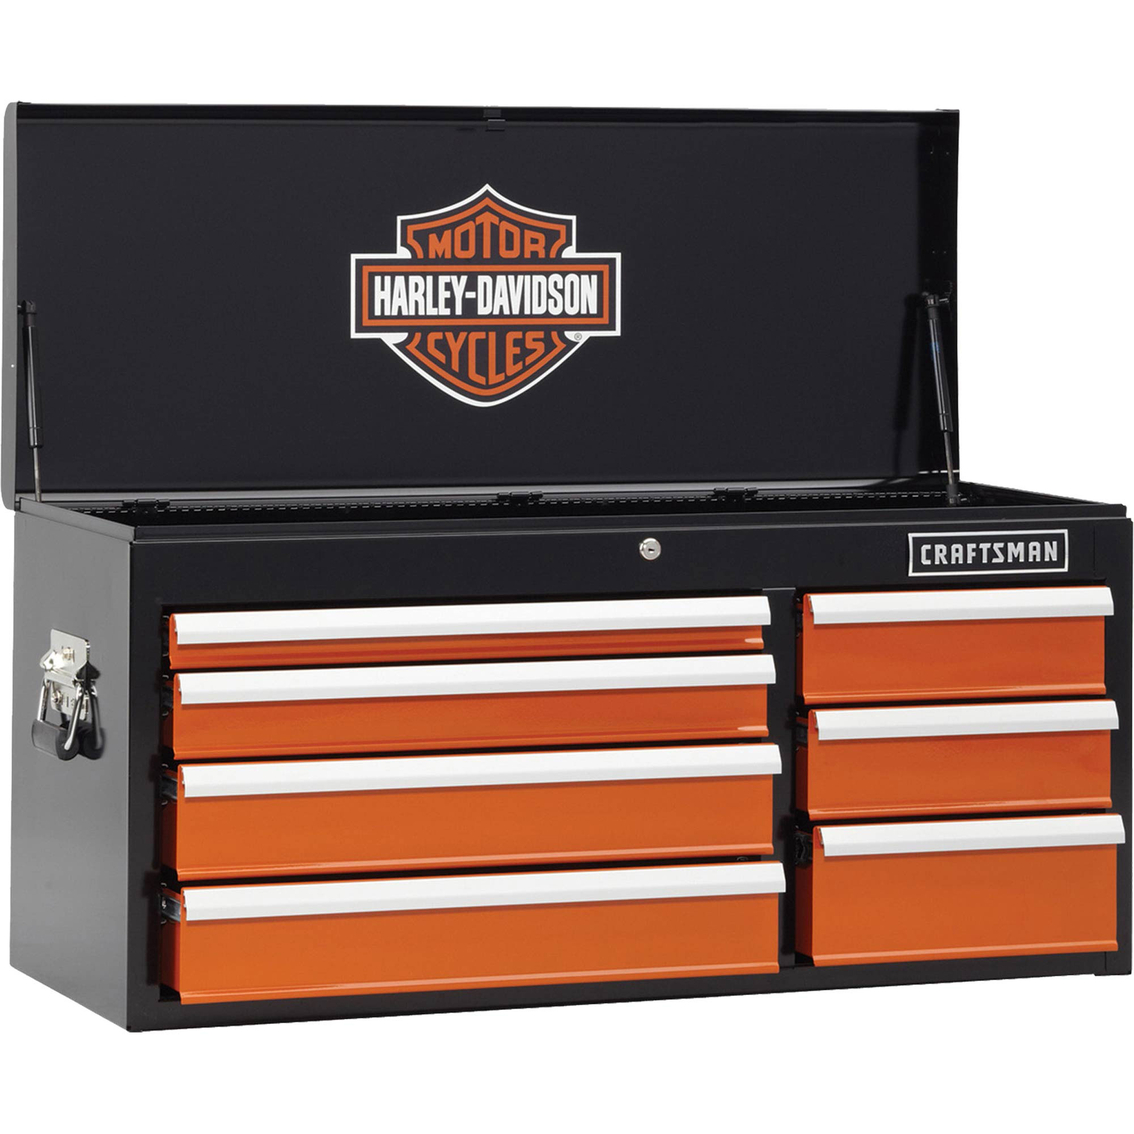 Craftsman Harley Davidson 40 In 7 Drawer Top Chest Tool